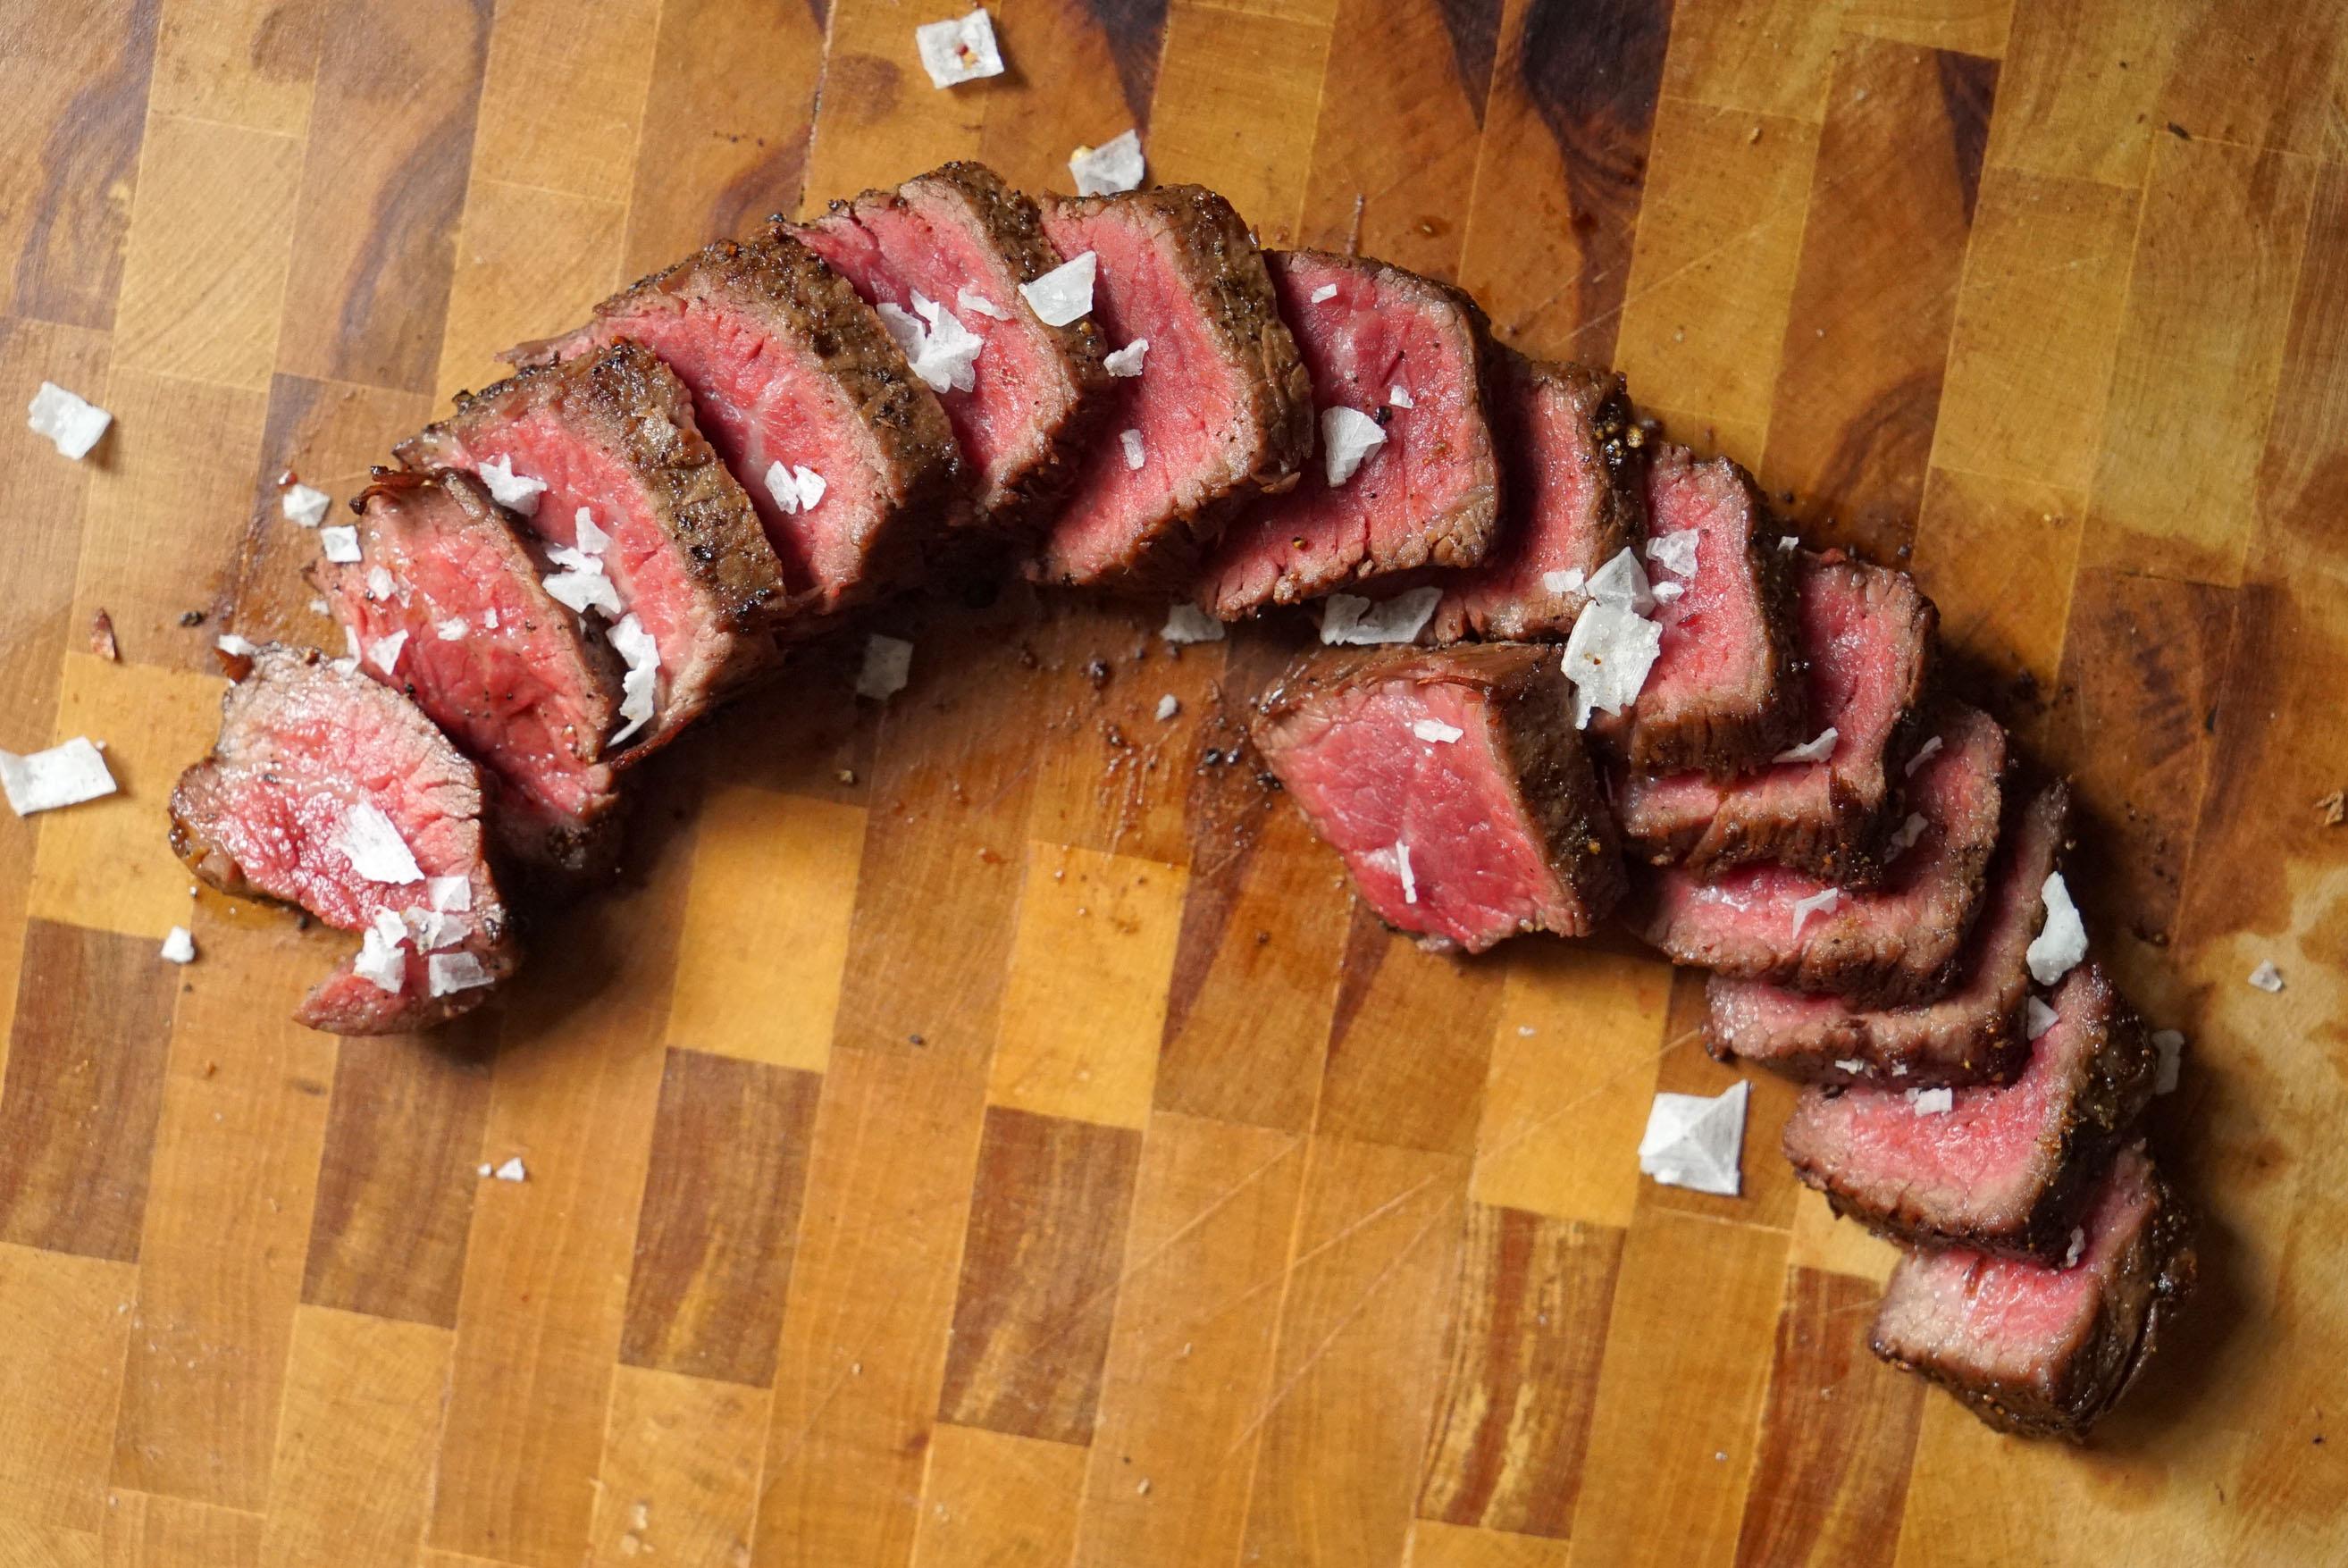 steak anatomy johnny prime